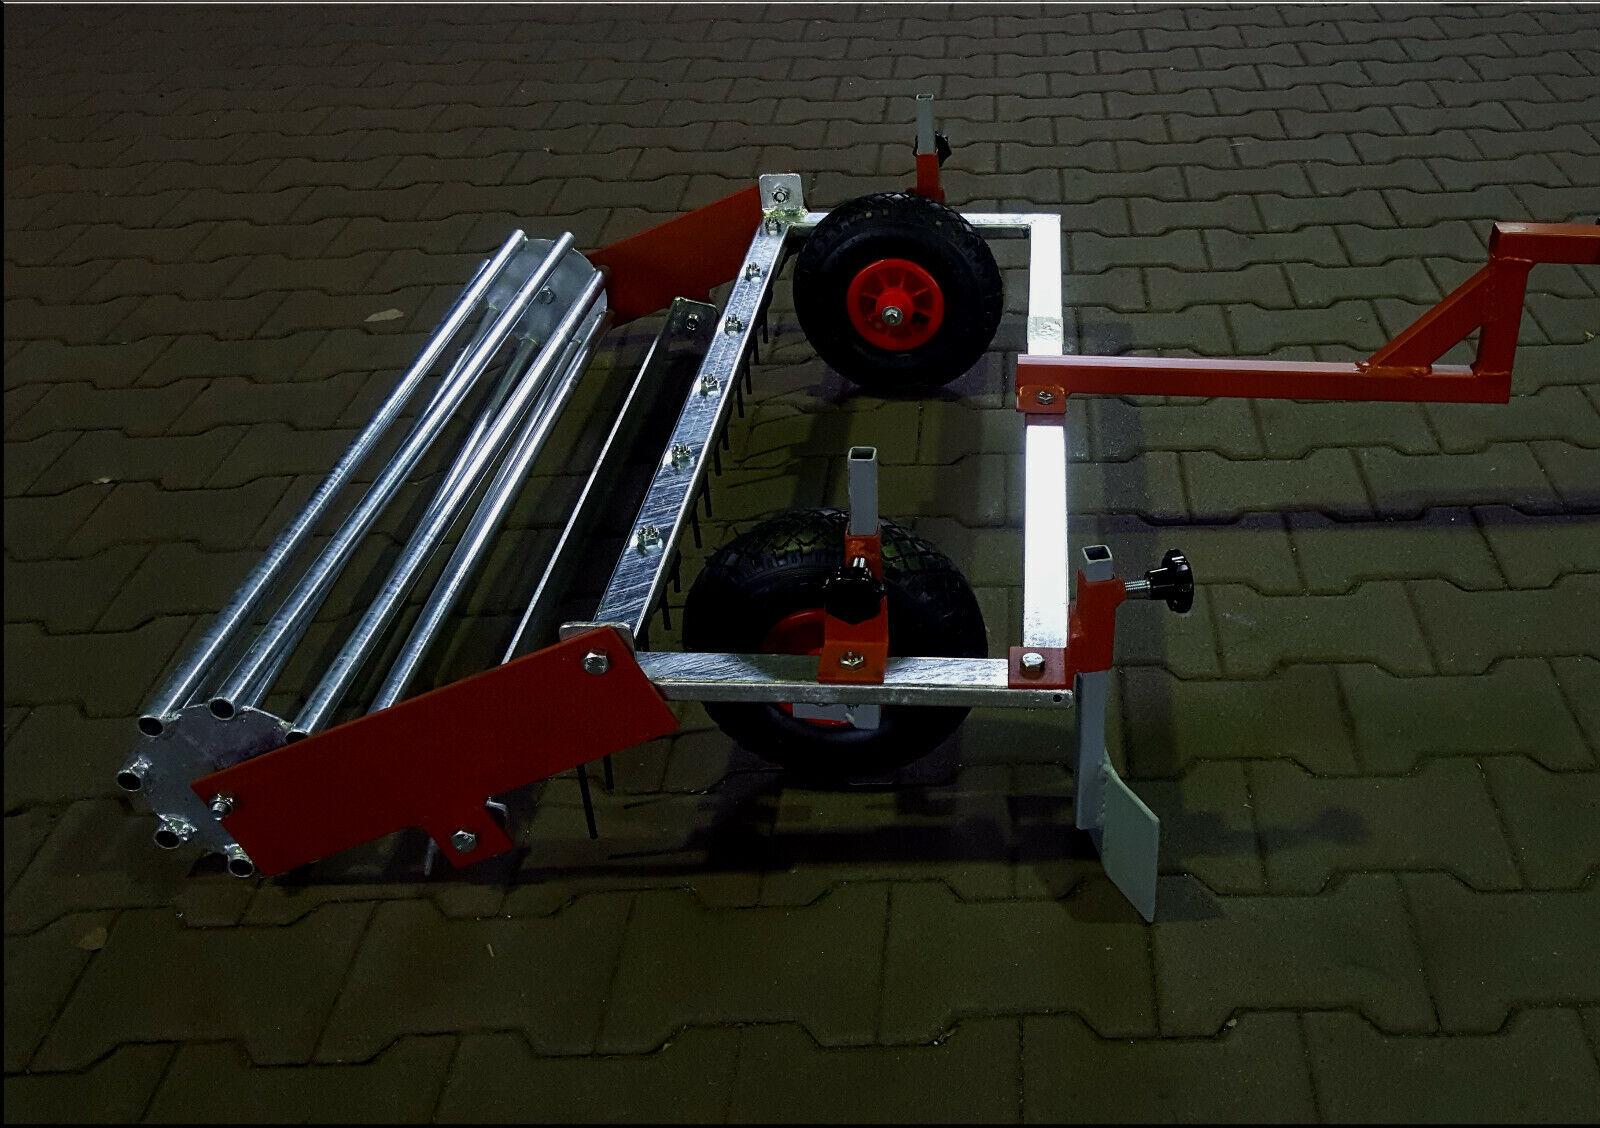 Kalio1000 Reitplatzplaner Reitbahnplaner -inkl. Räder mit Öse